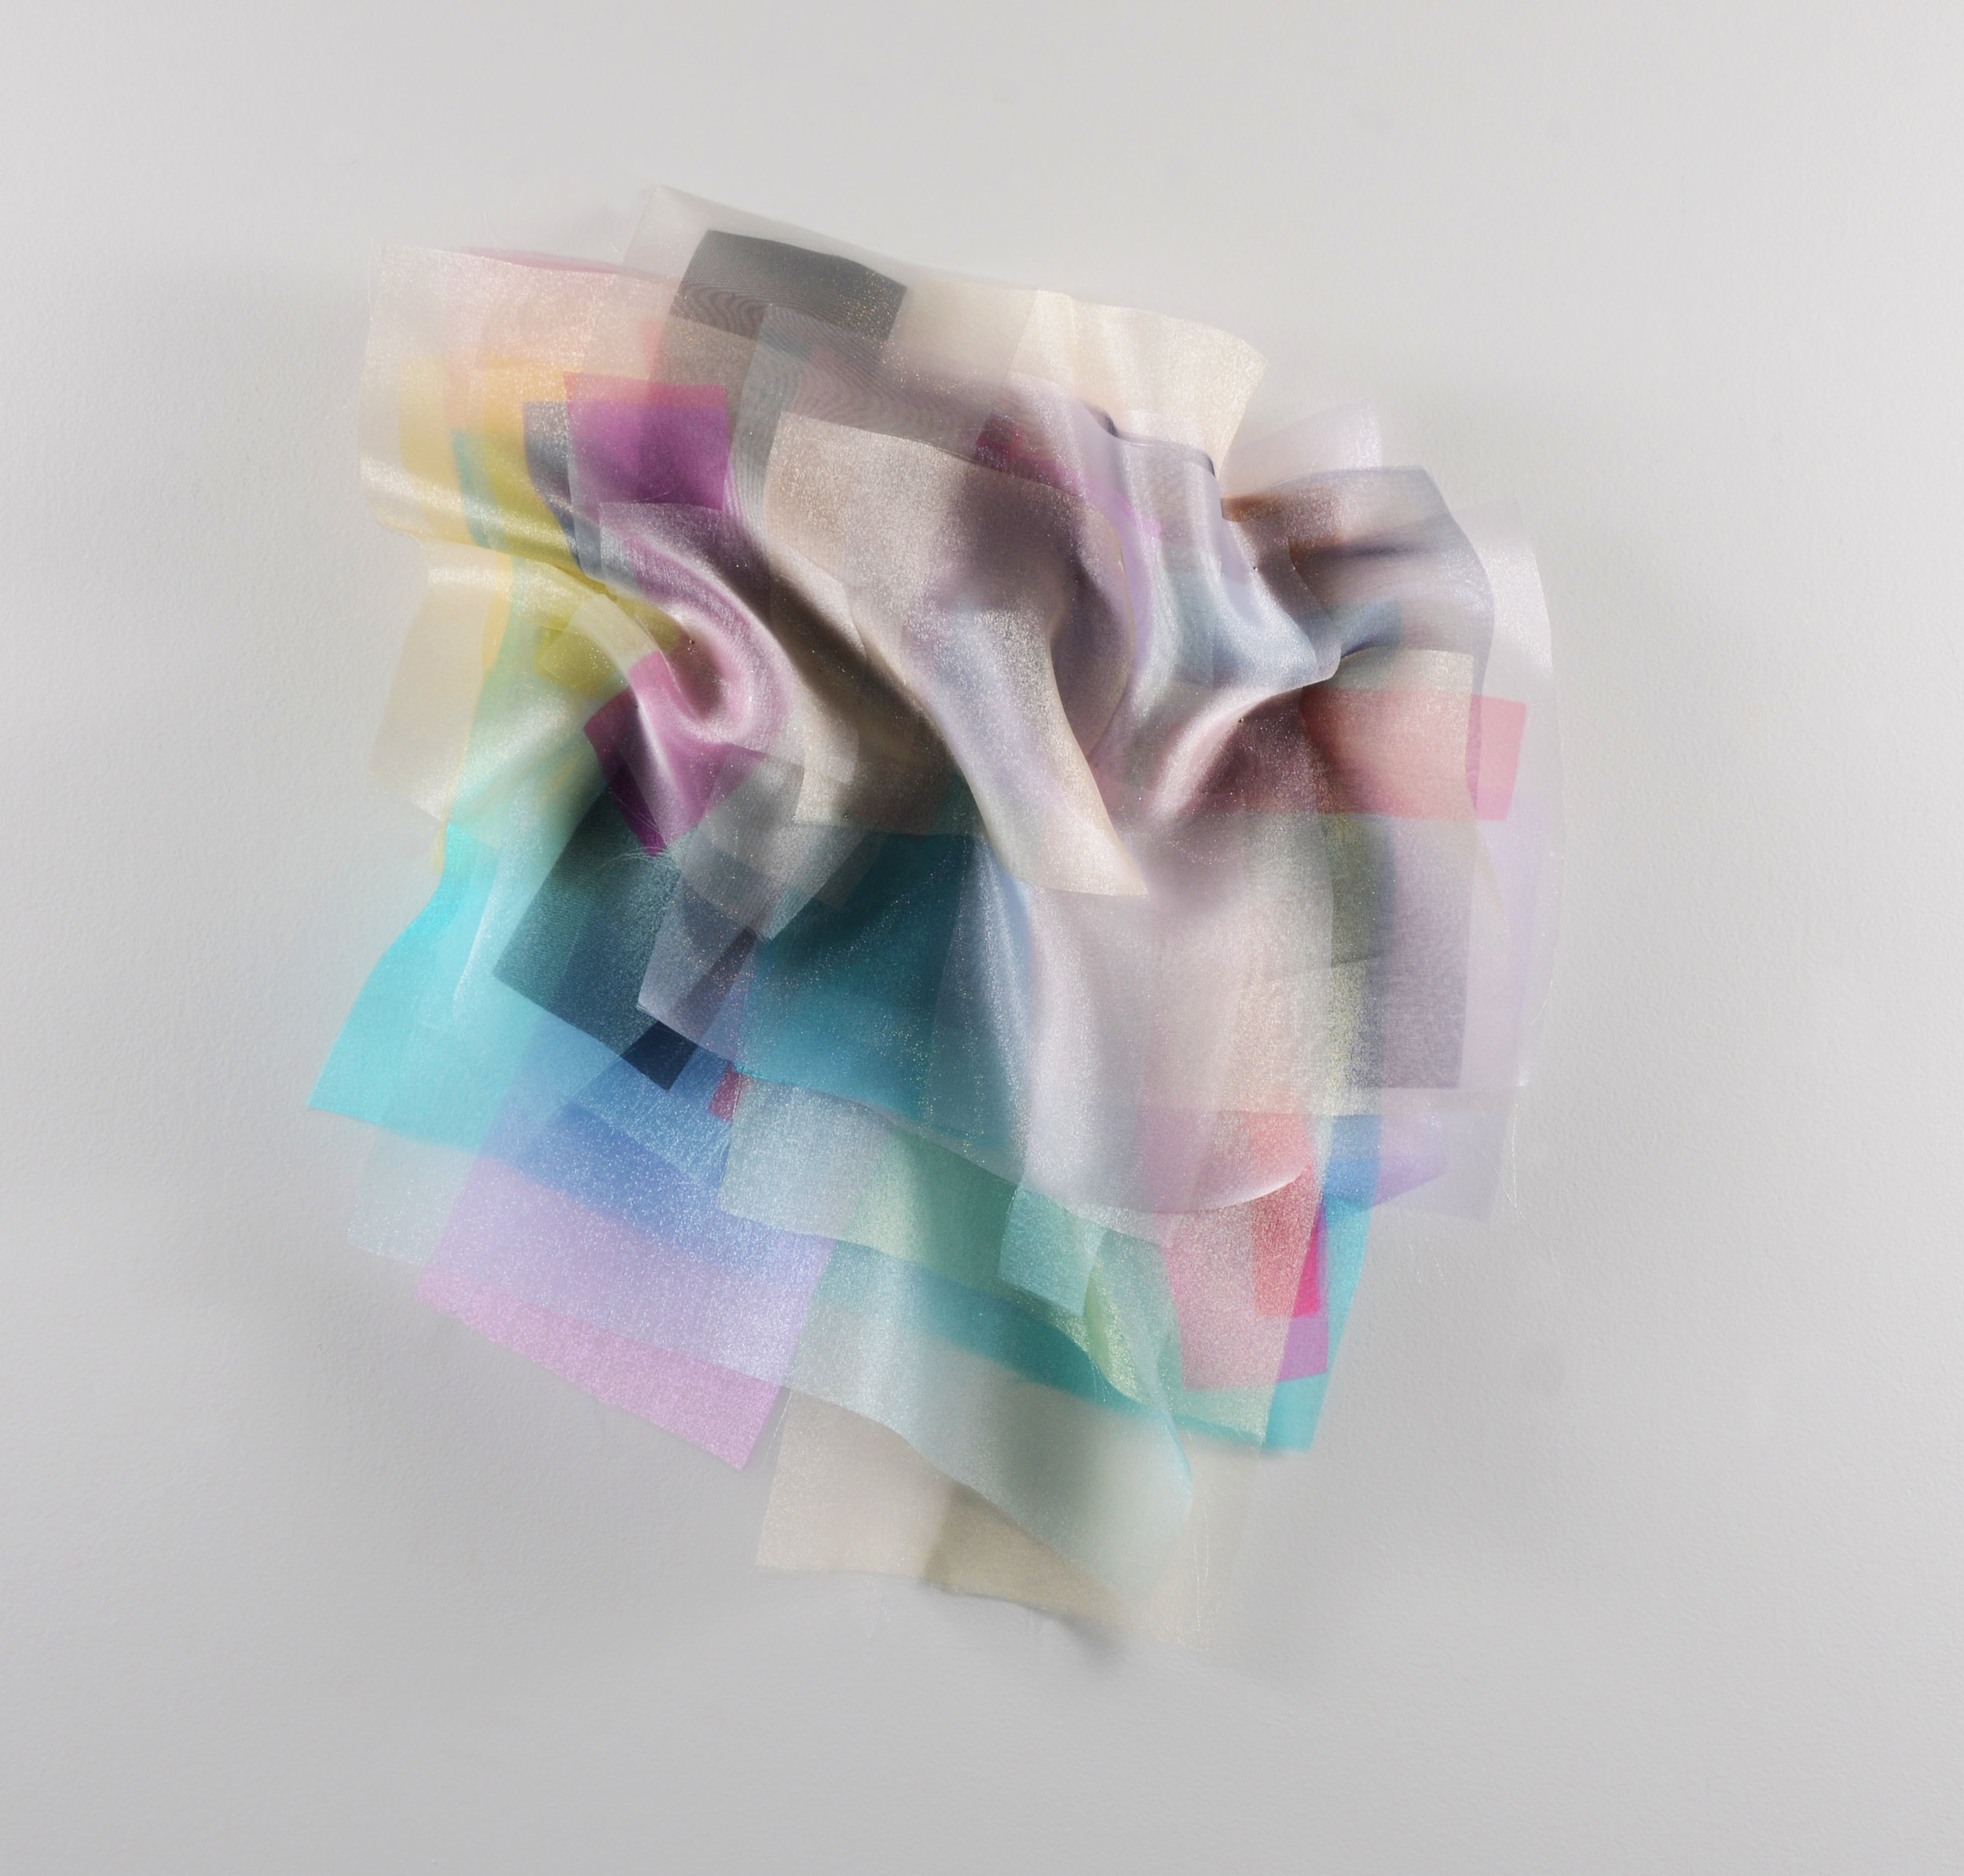 ledbetter_kirsten_layered_pastels.jpg